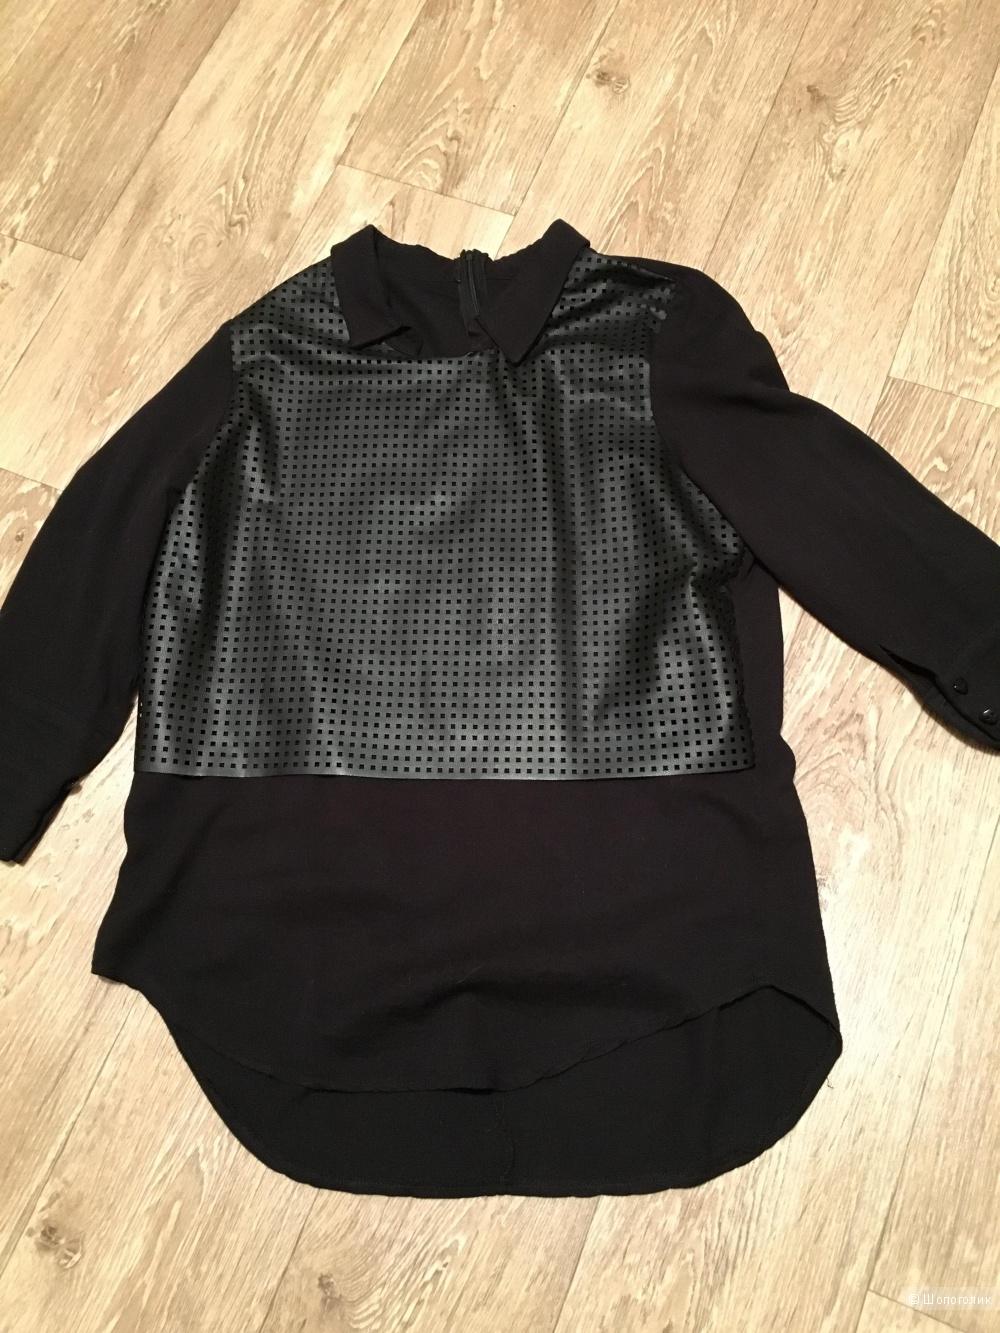 Рубашка без бренда, 44-46 размер